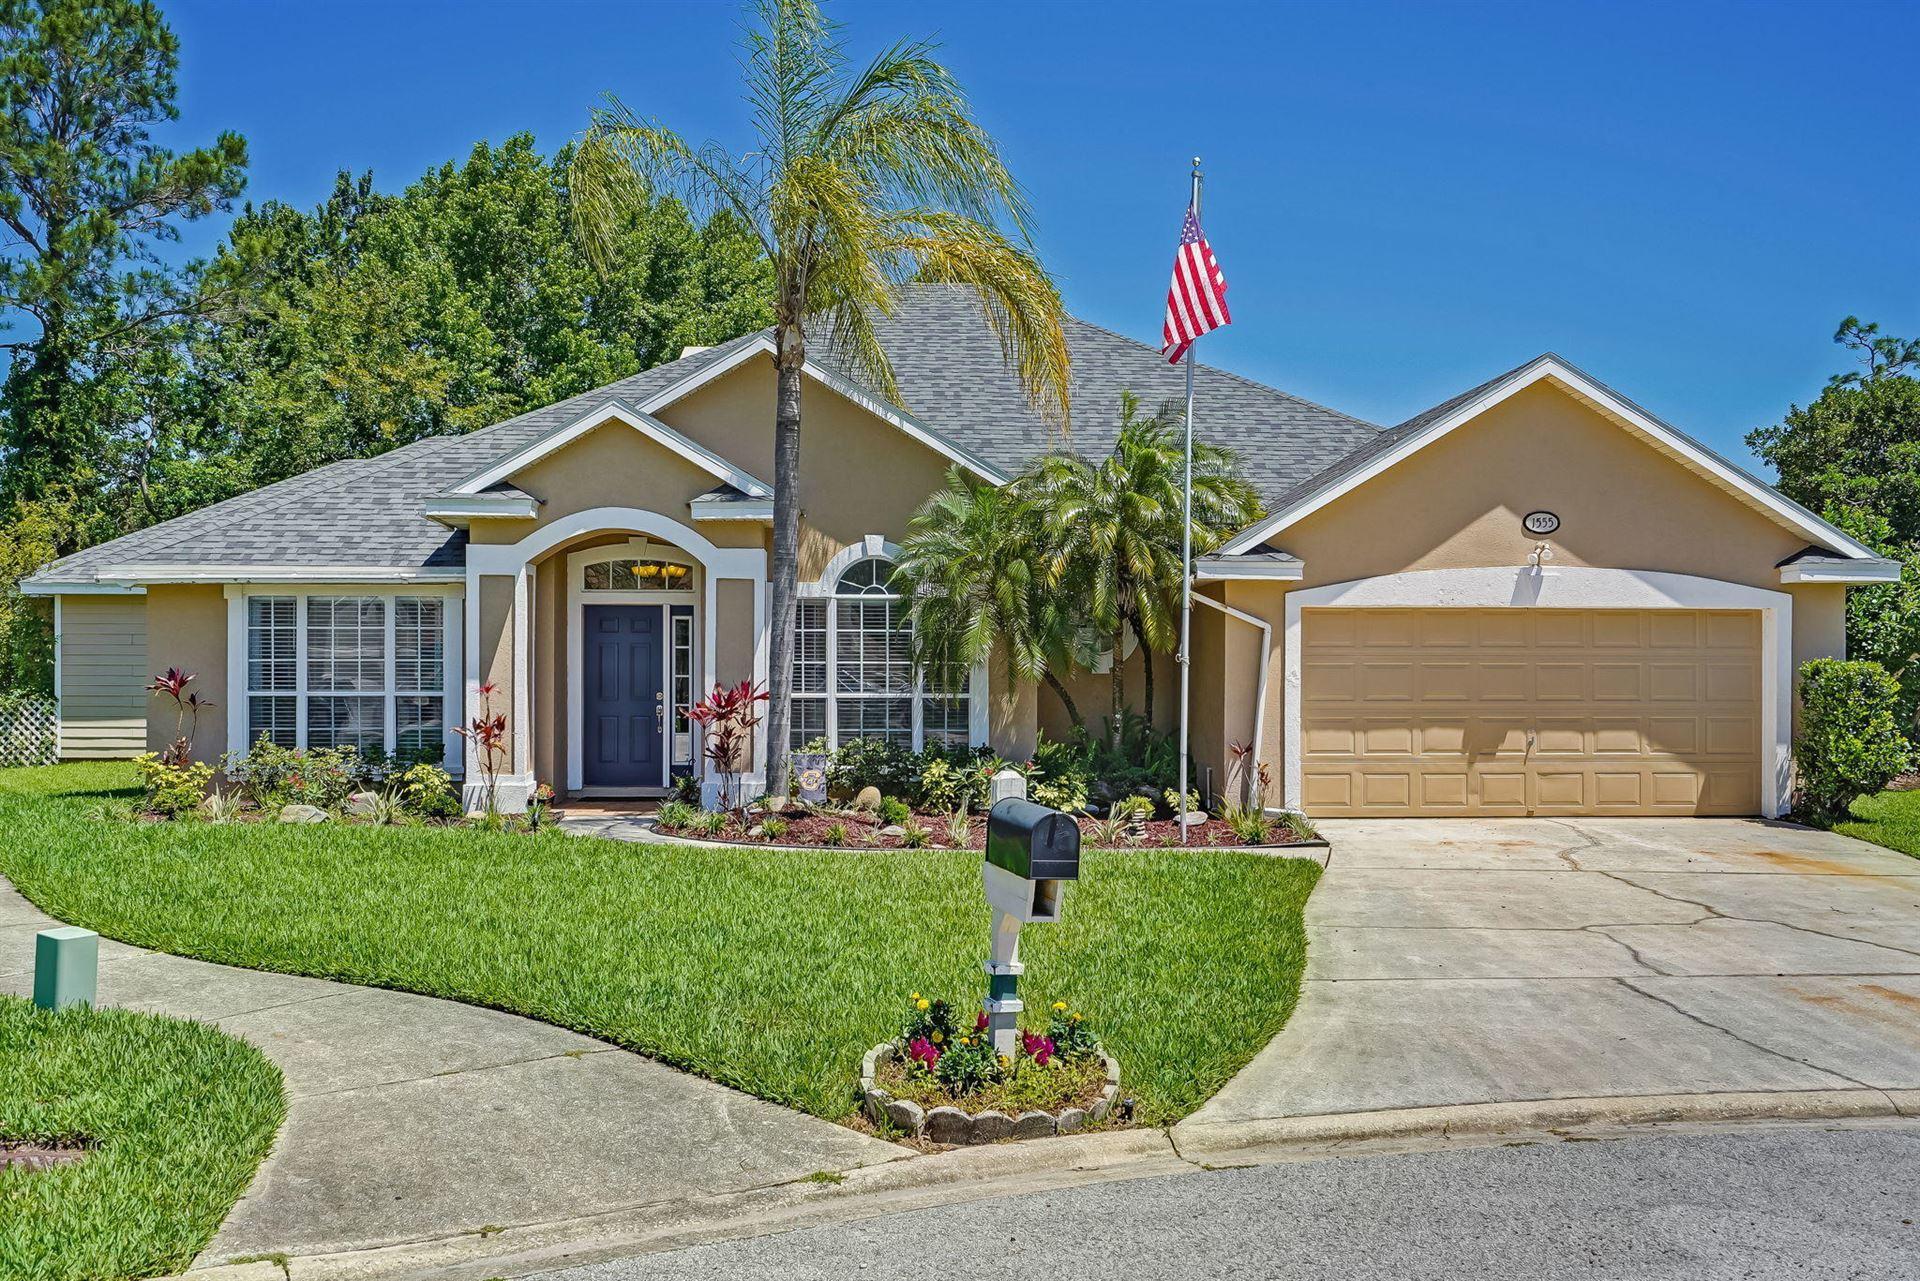 Photo of 1555 LAKEWAY DR, ORANGE PARK, FL 32003 (MLS # 1108795)